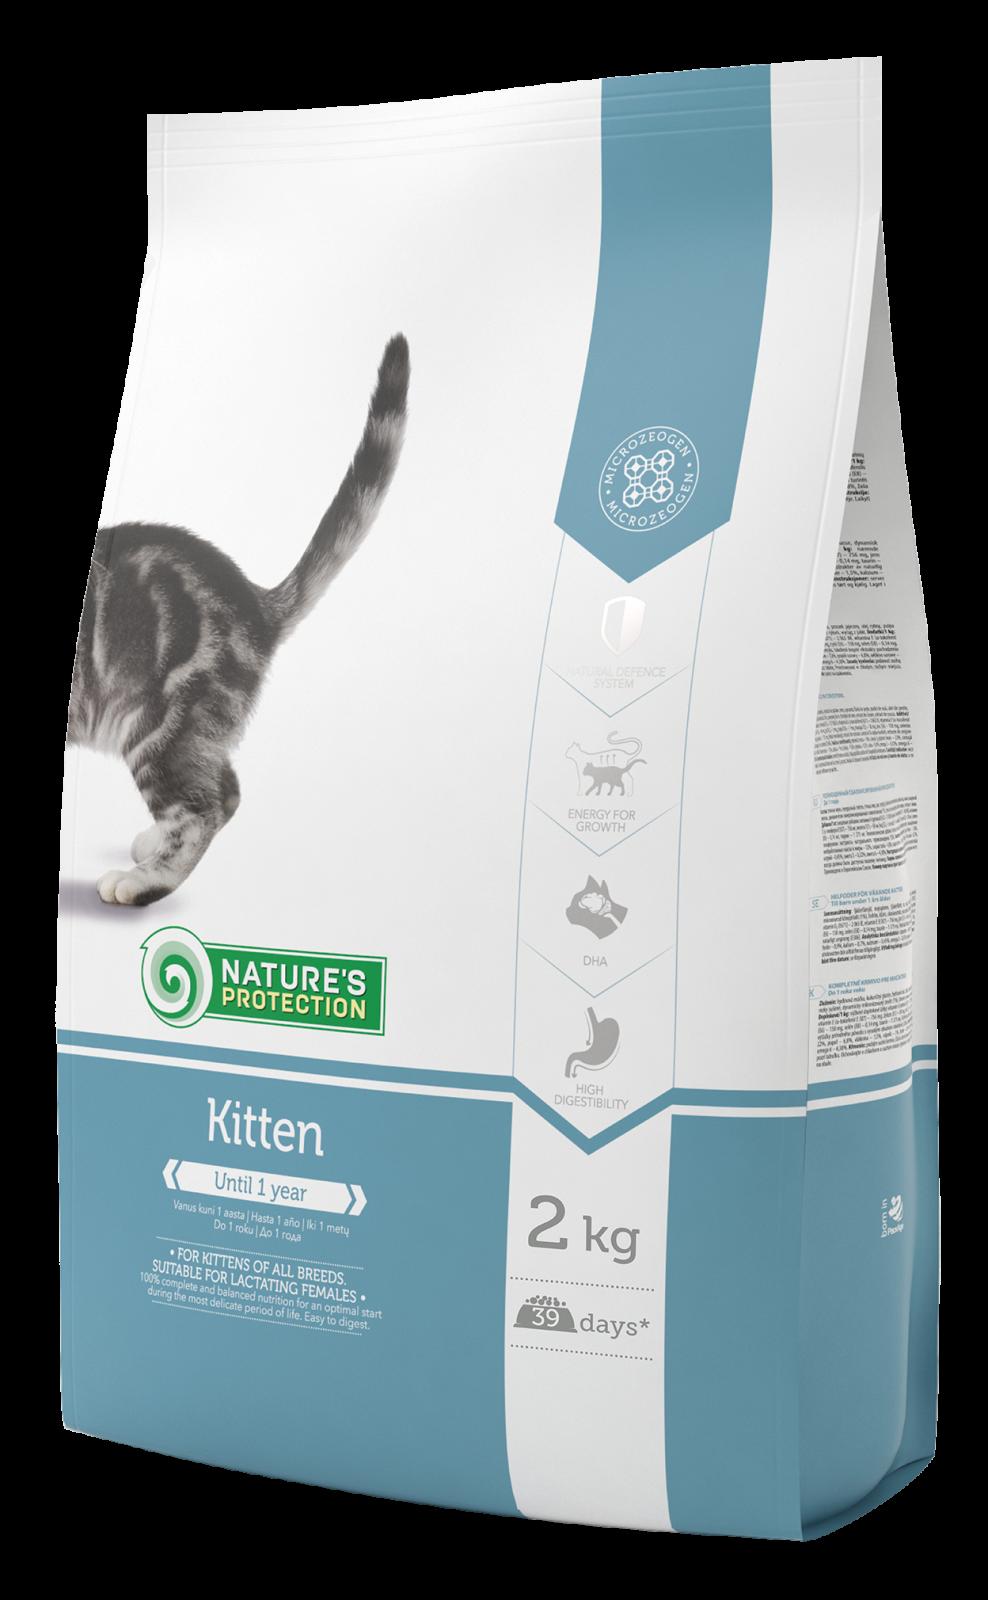 Nature's Protection Cat Kitten 2kg